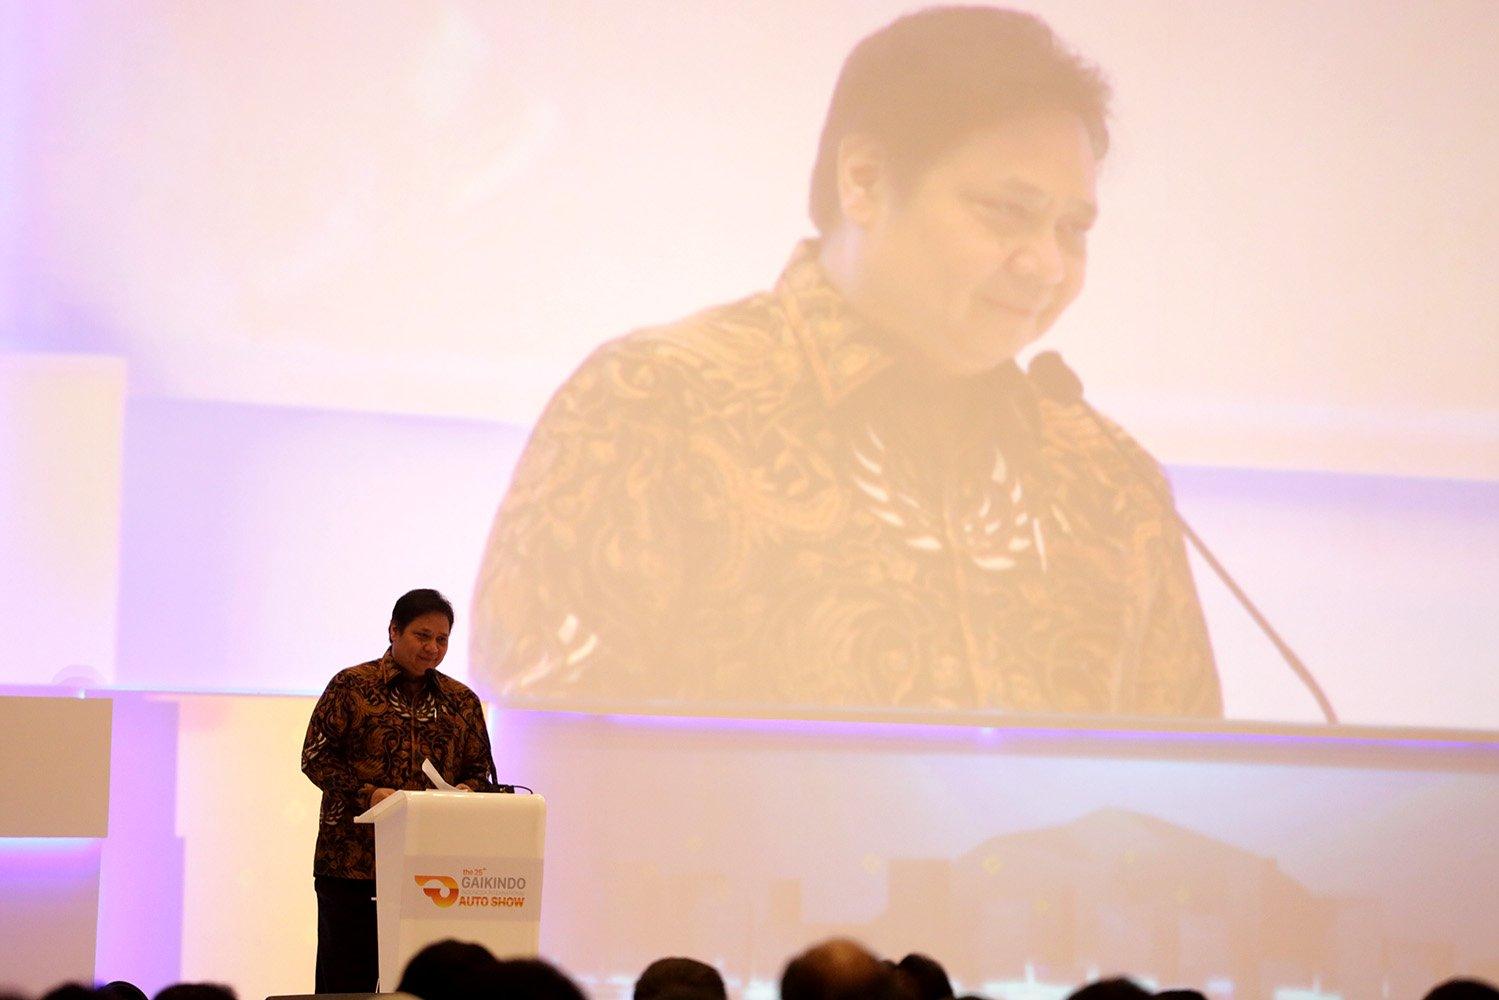 Menteri Perindustian, Airlangga Hartanto, memberikan sambutan pada acara GIIAS 2017, di Tangerang, Banten, Kamis, (10/08)